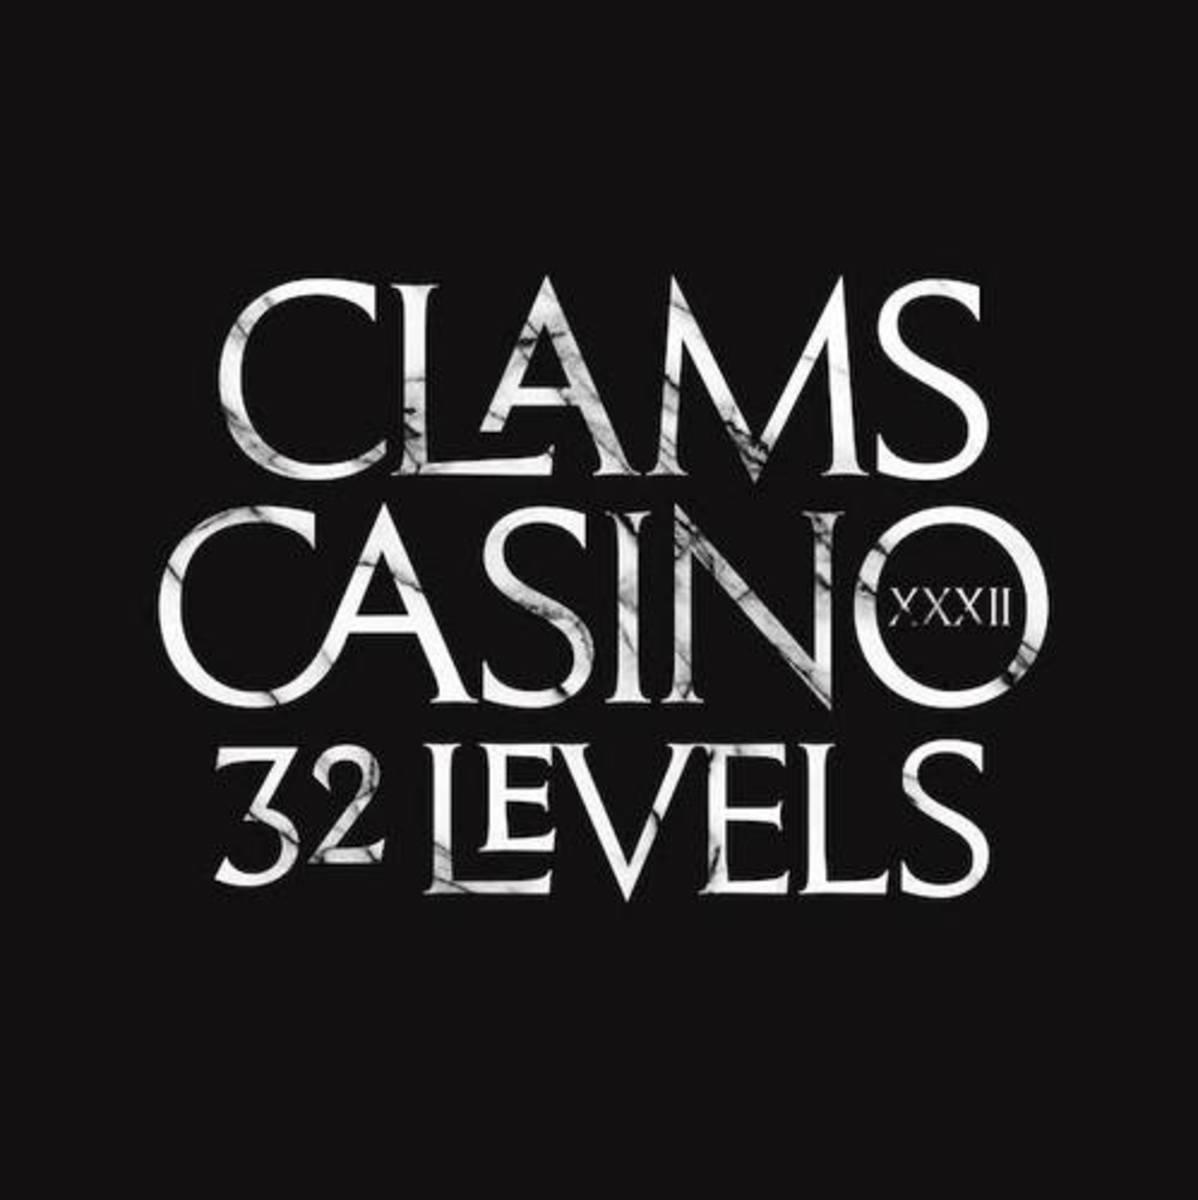 clams-casino-32-levels.jpg